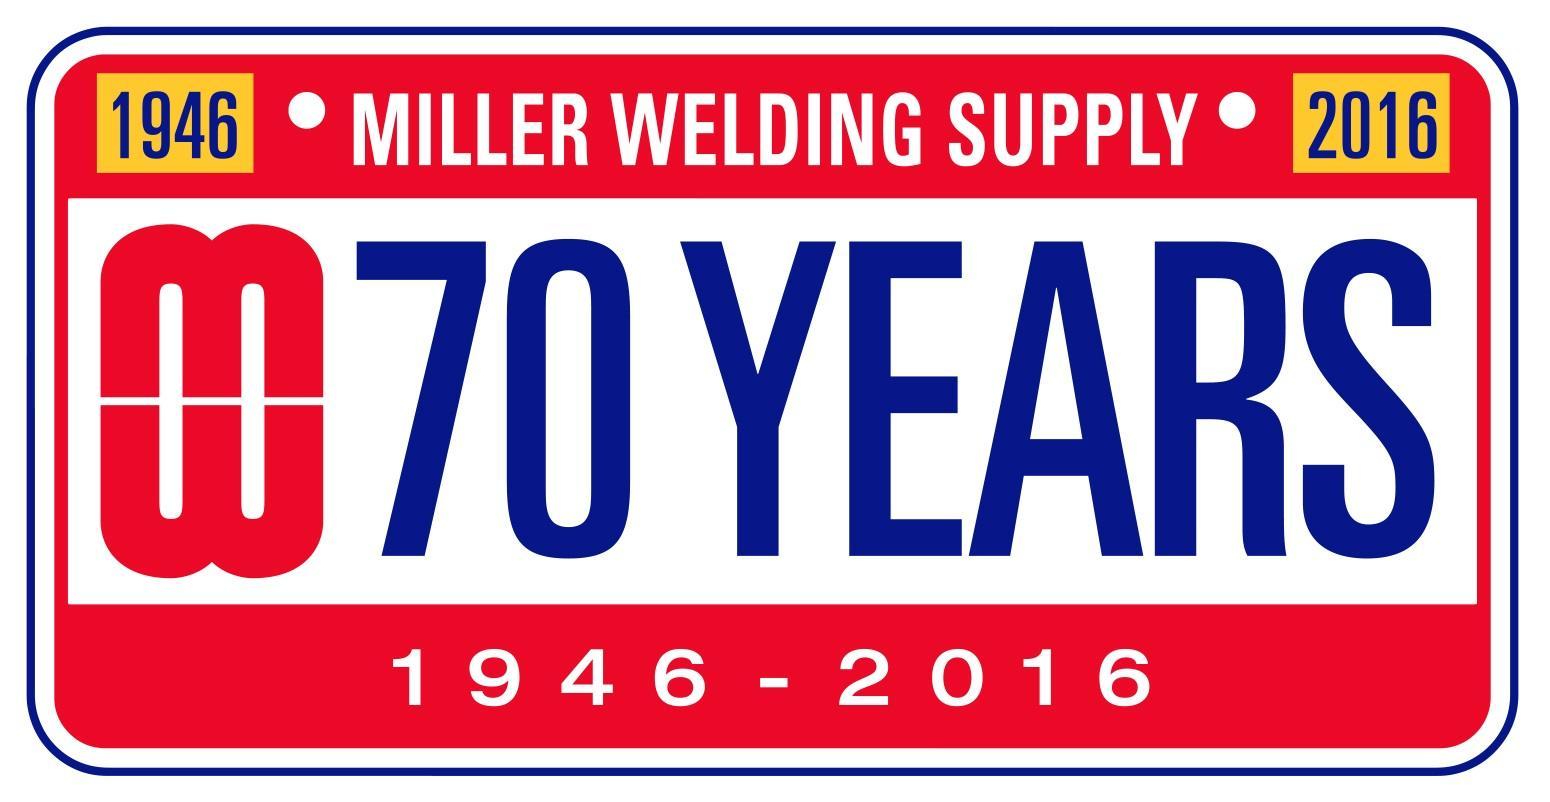 Miller Welding Supply Co image 1